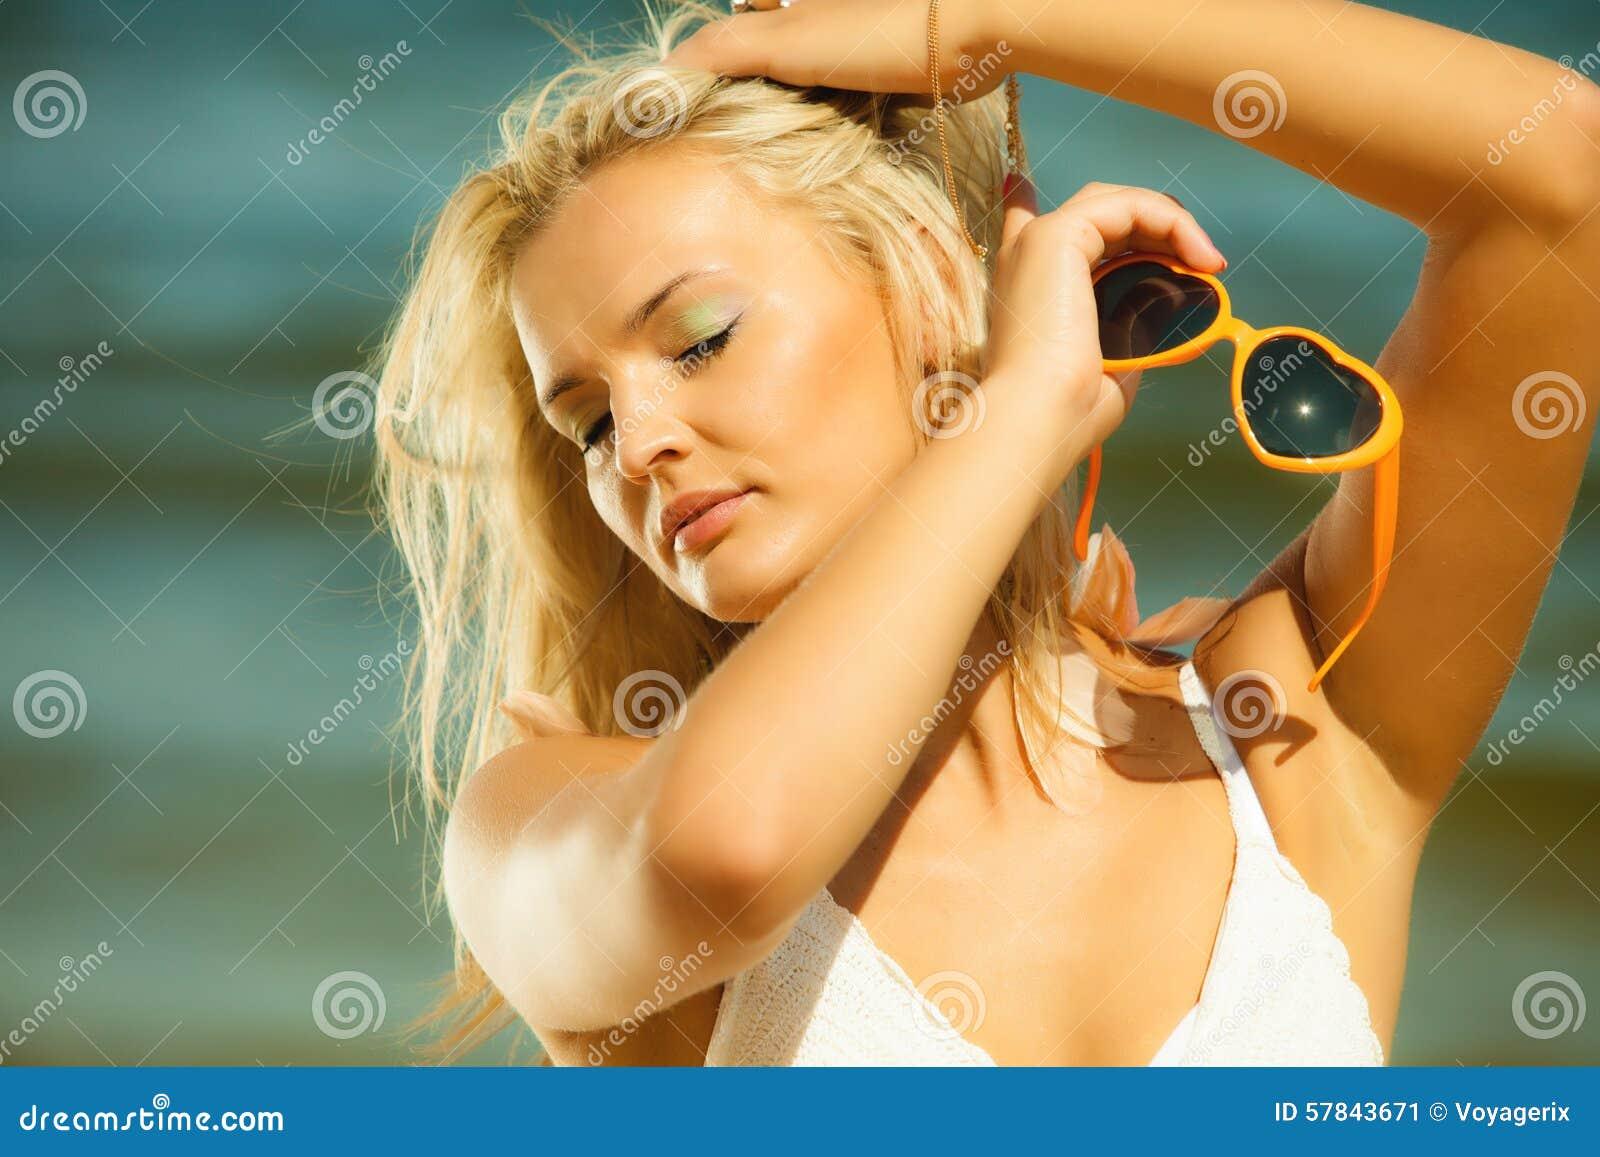 Of blond teen holding sunglasses